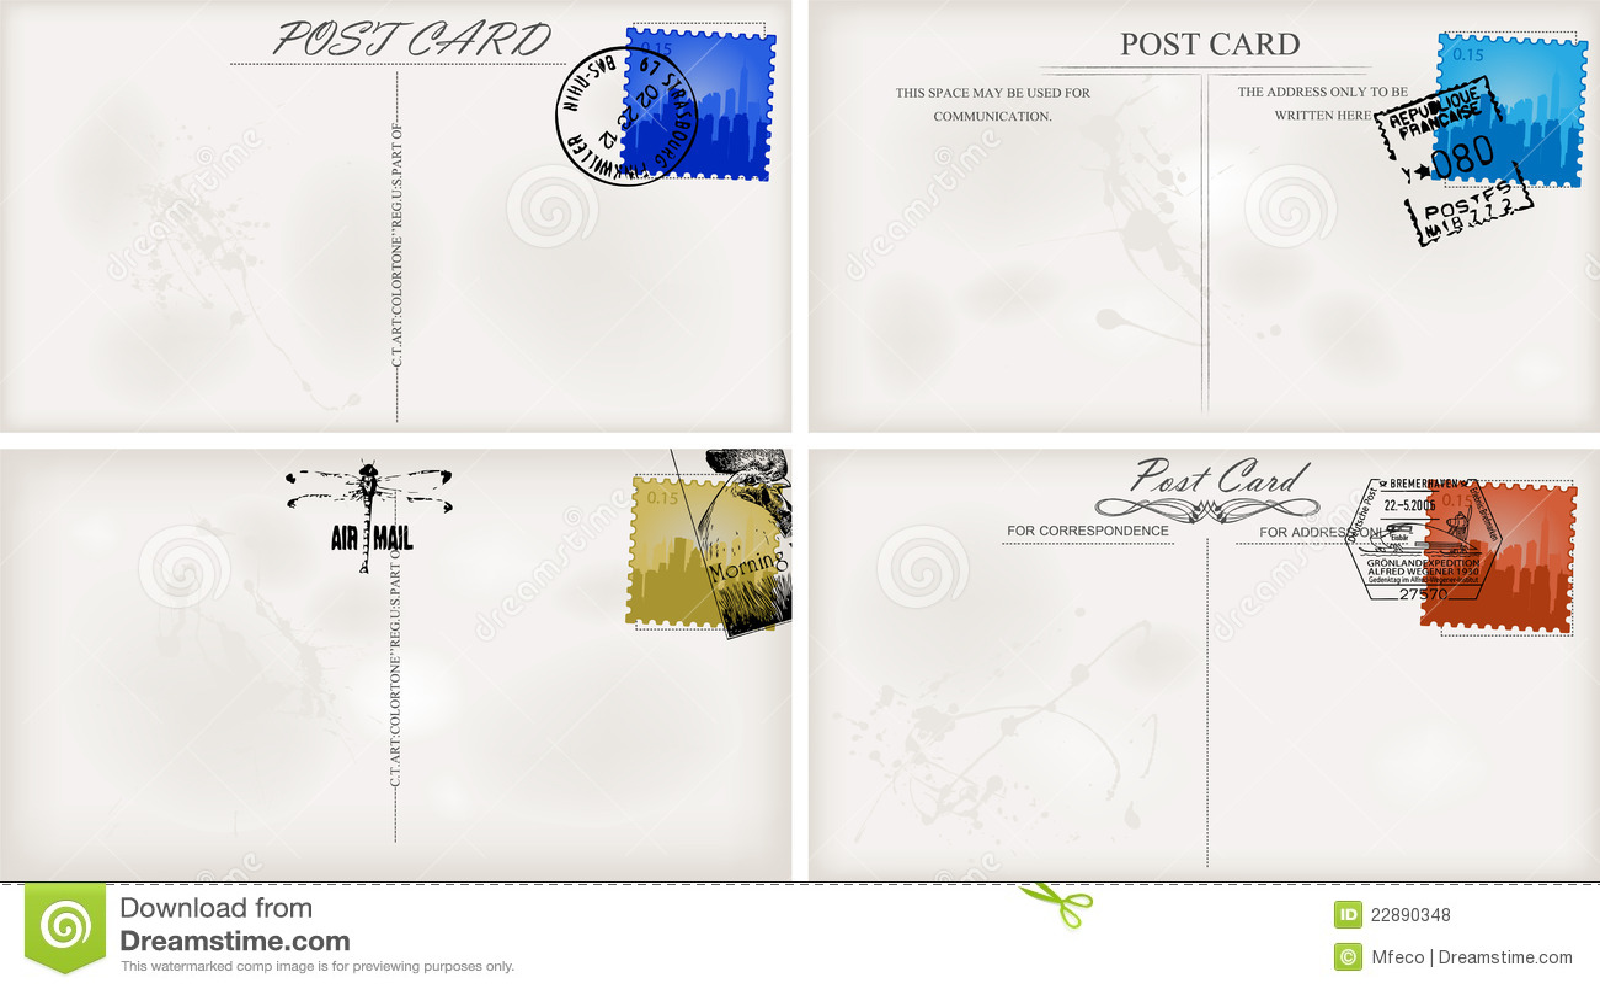 Vintage Postcard Designs Royalty Free Stock Photos Image